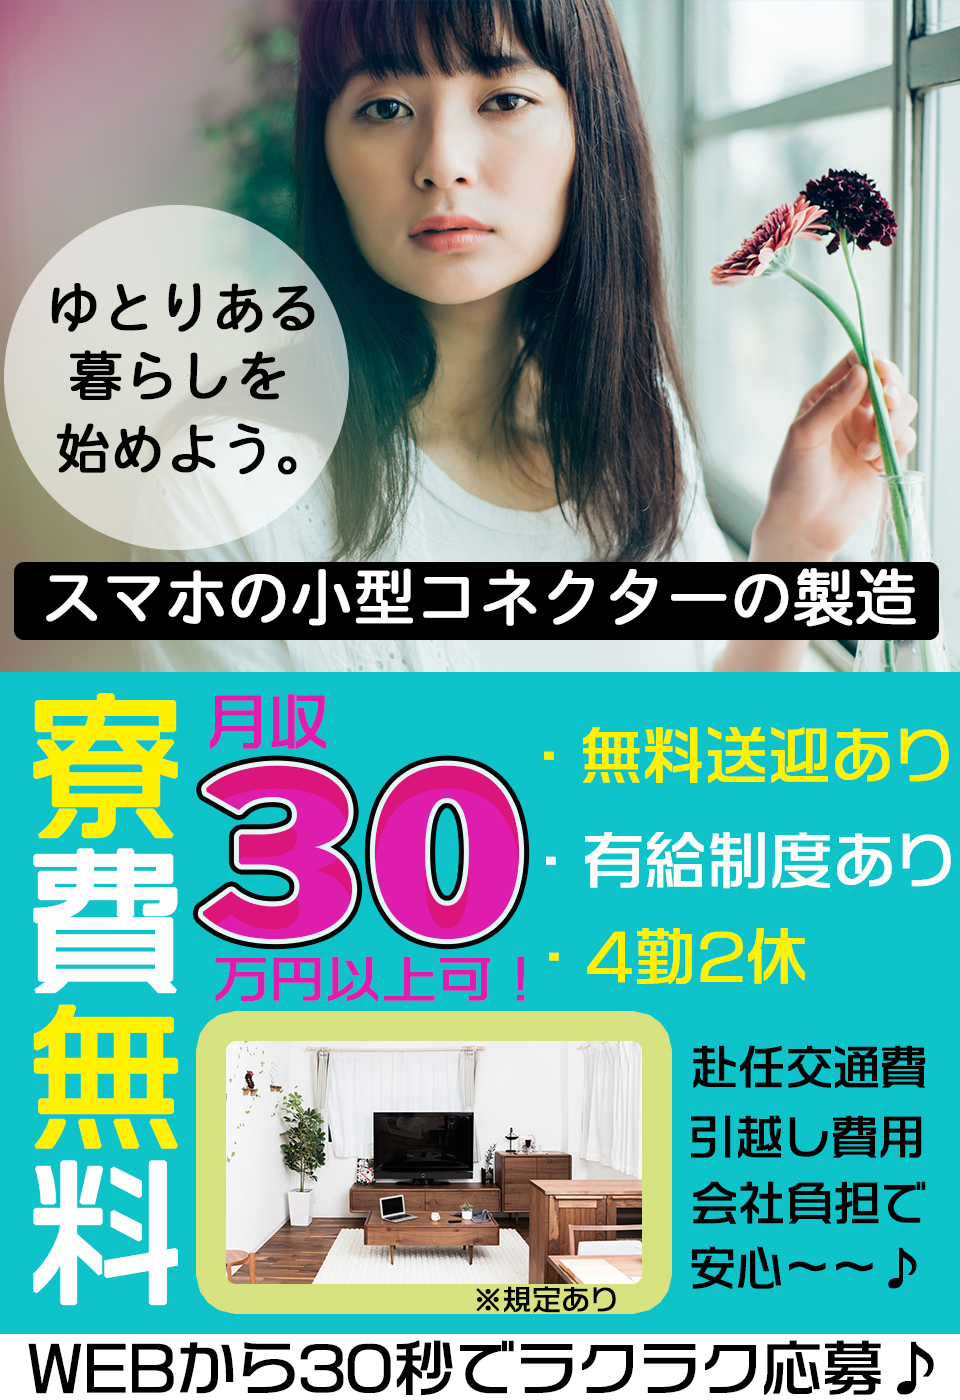 Yamagata mainr4